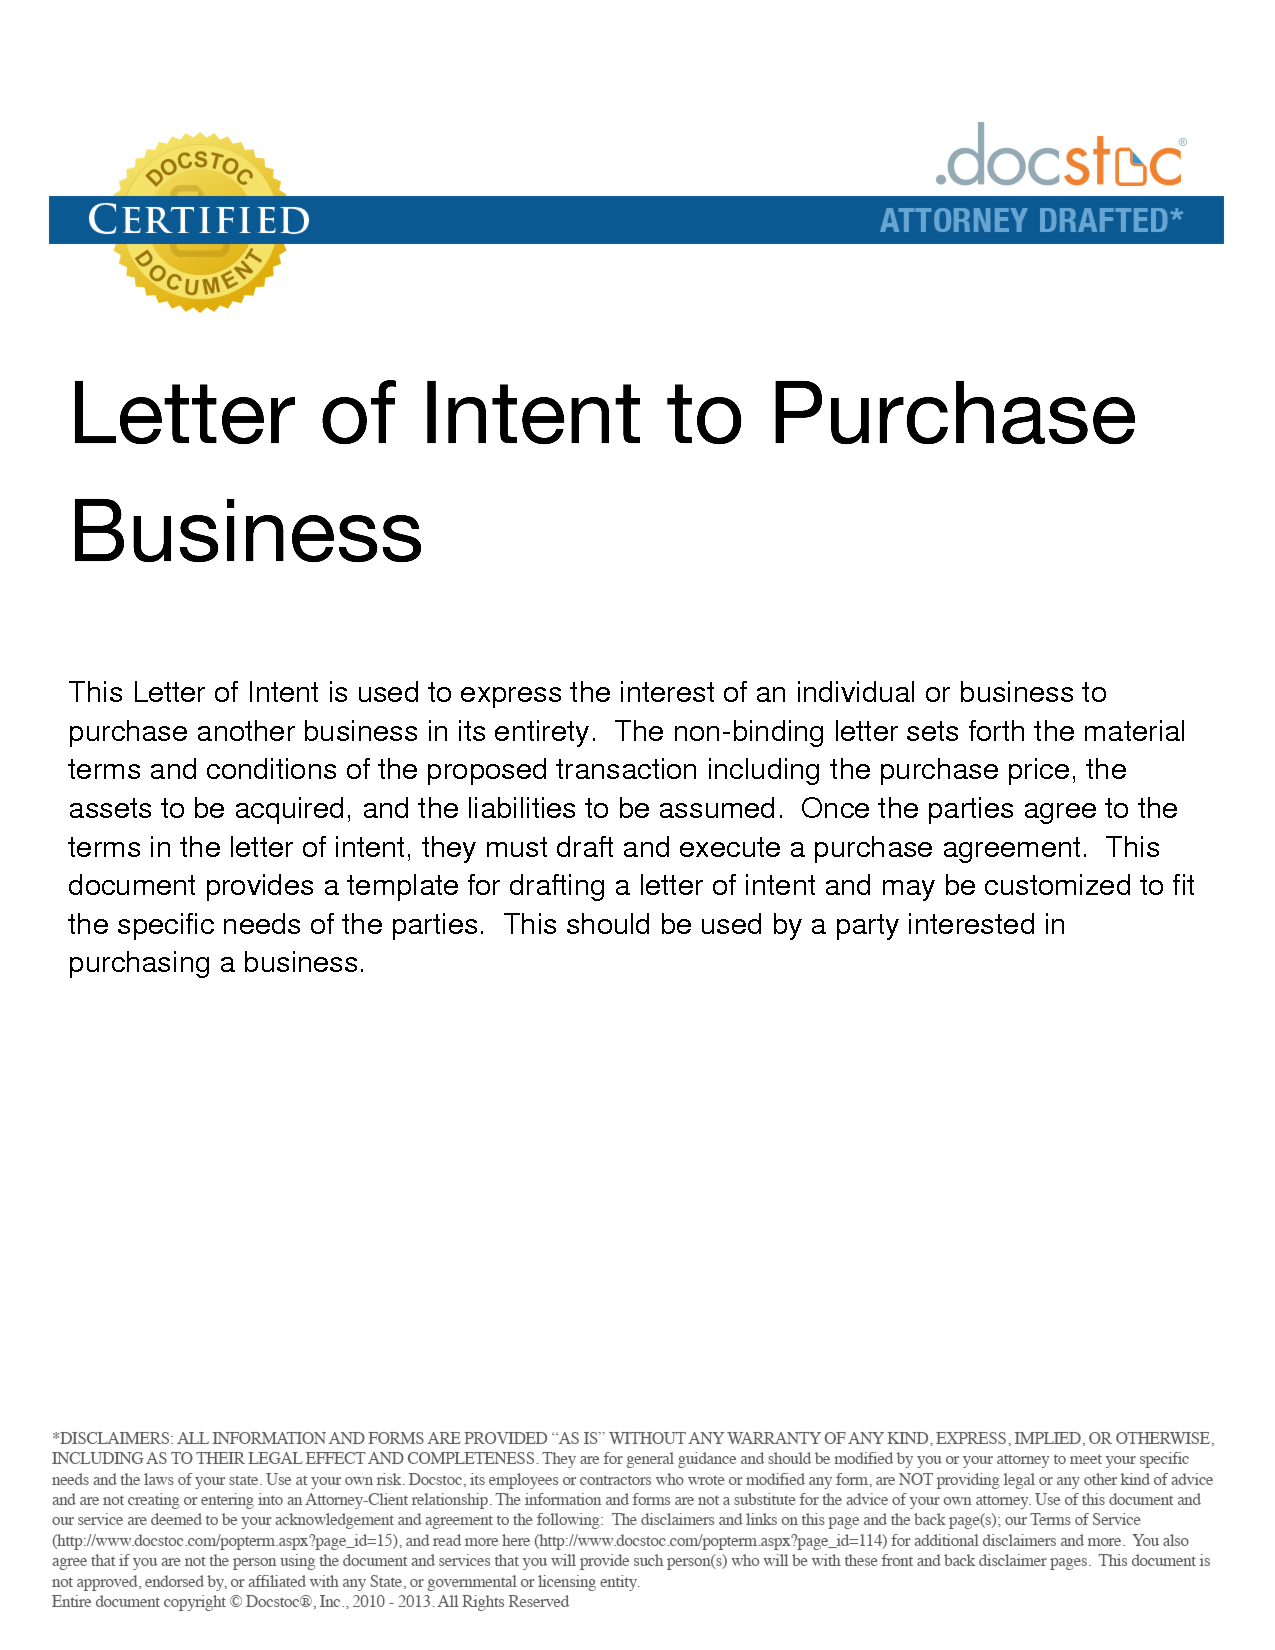 Custom Essay Writing Services Uk Cuptech Sro Idea Rs Letter